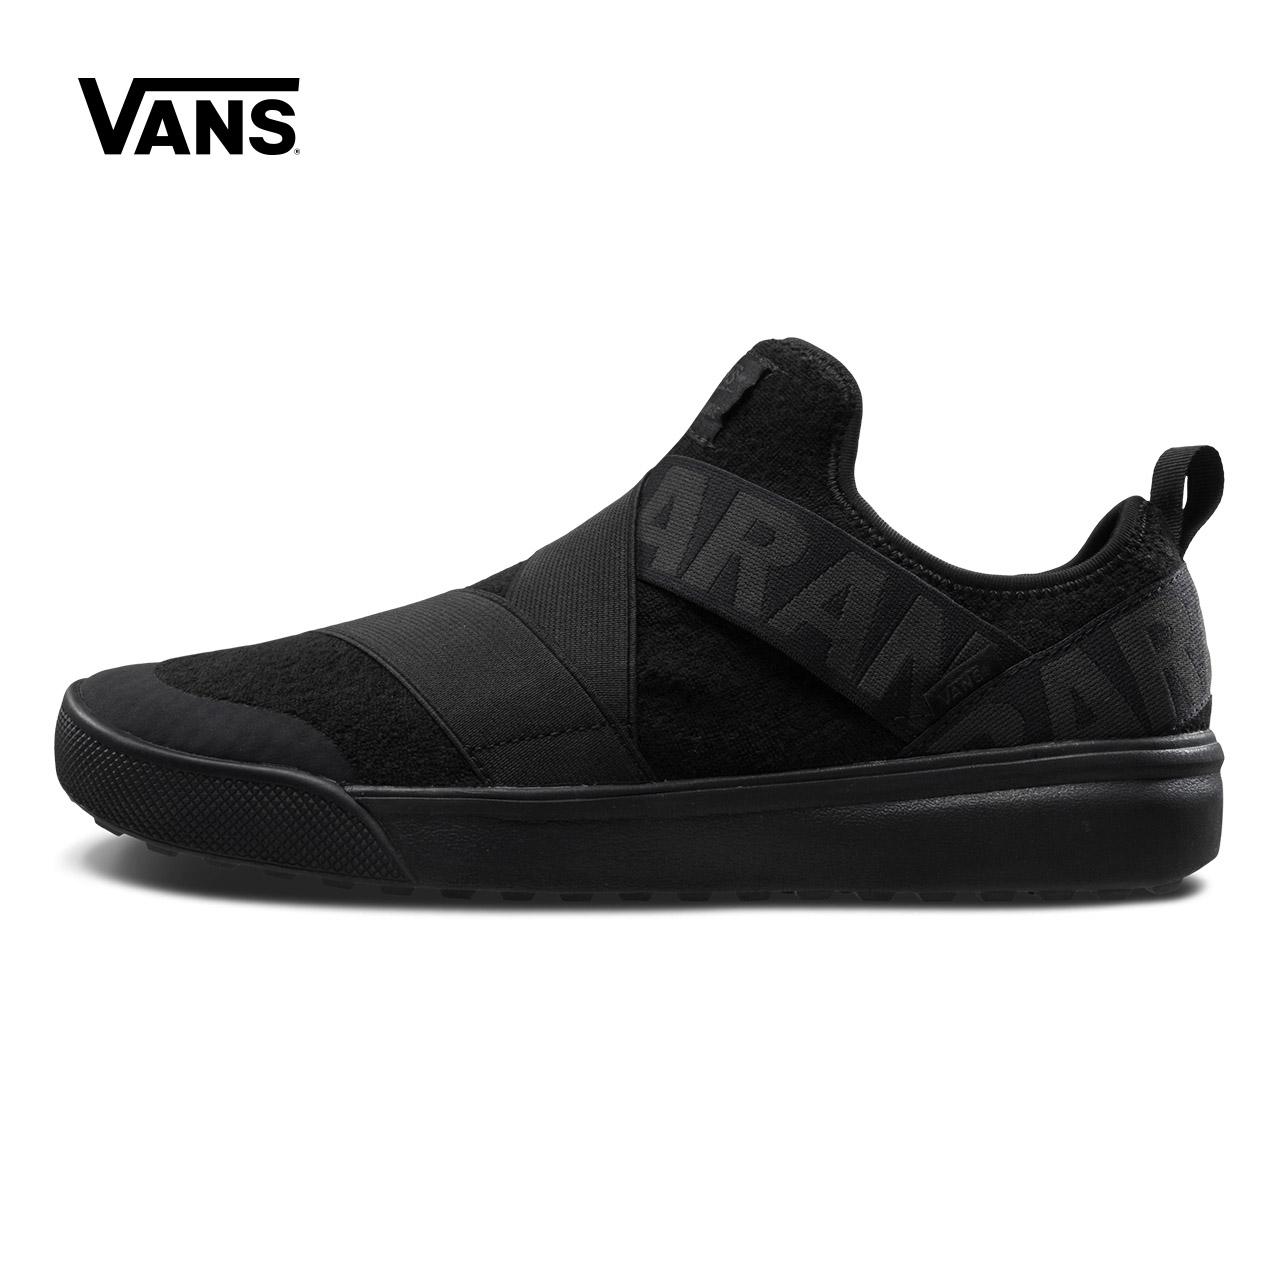 Vans 范斯官方男女款ULTRARANGE休闲鞋|VN0A3MVRUDH